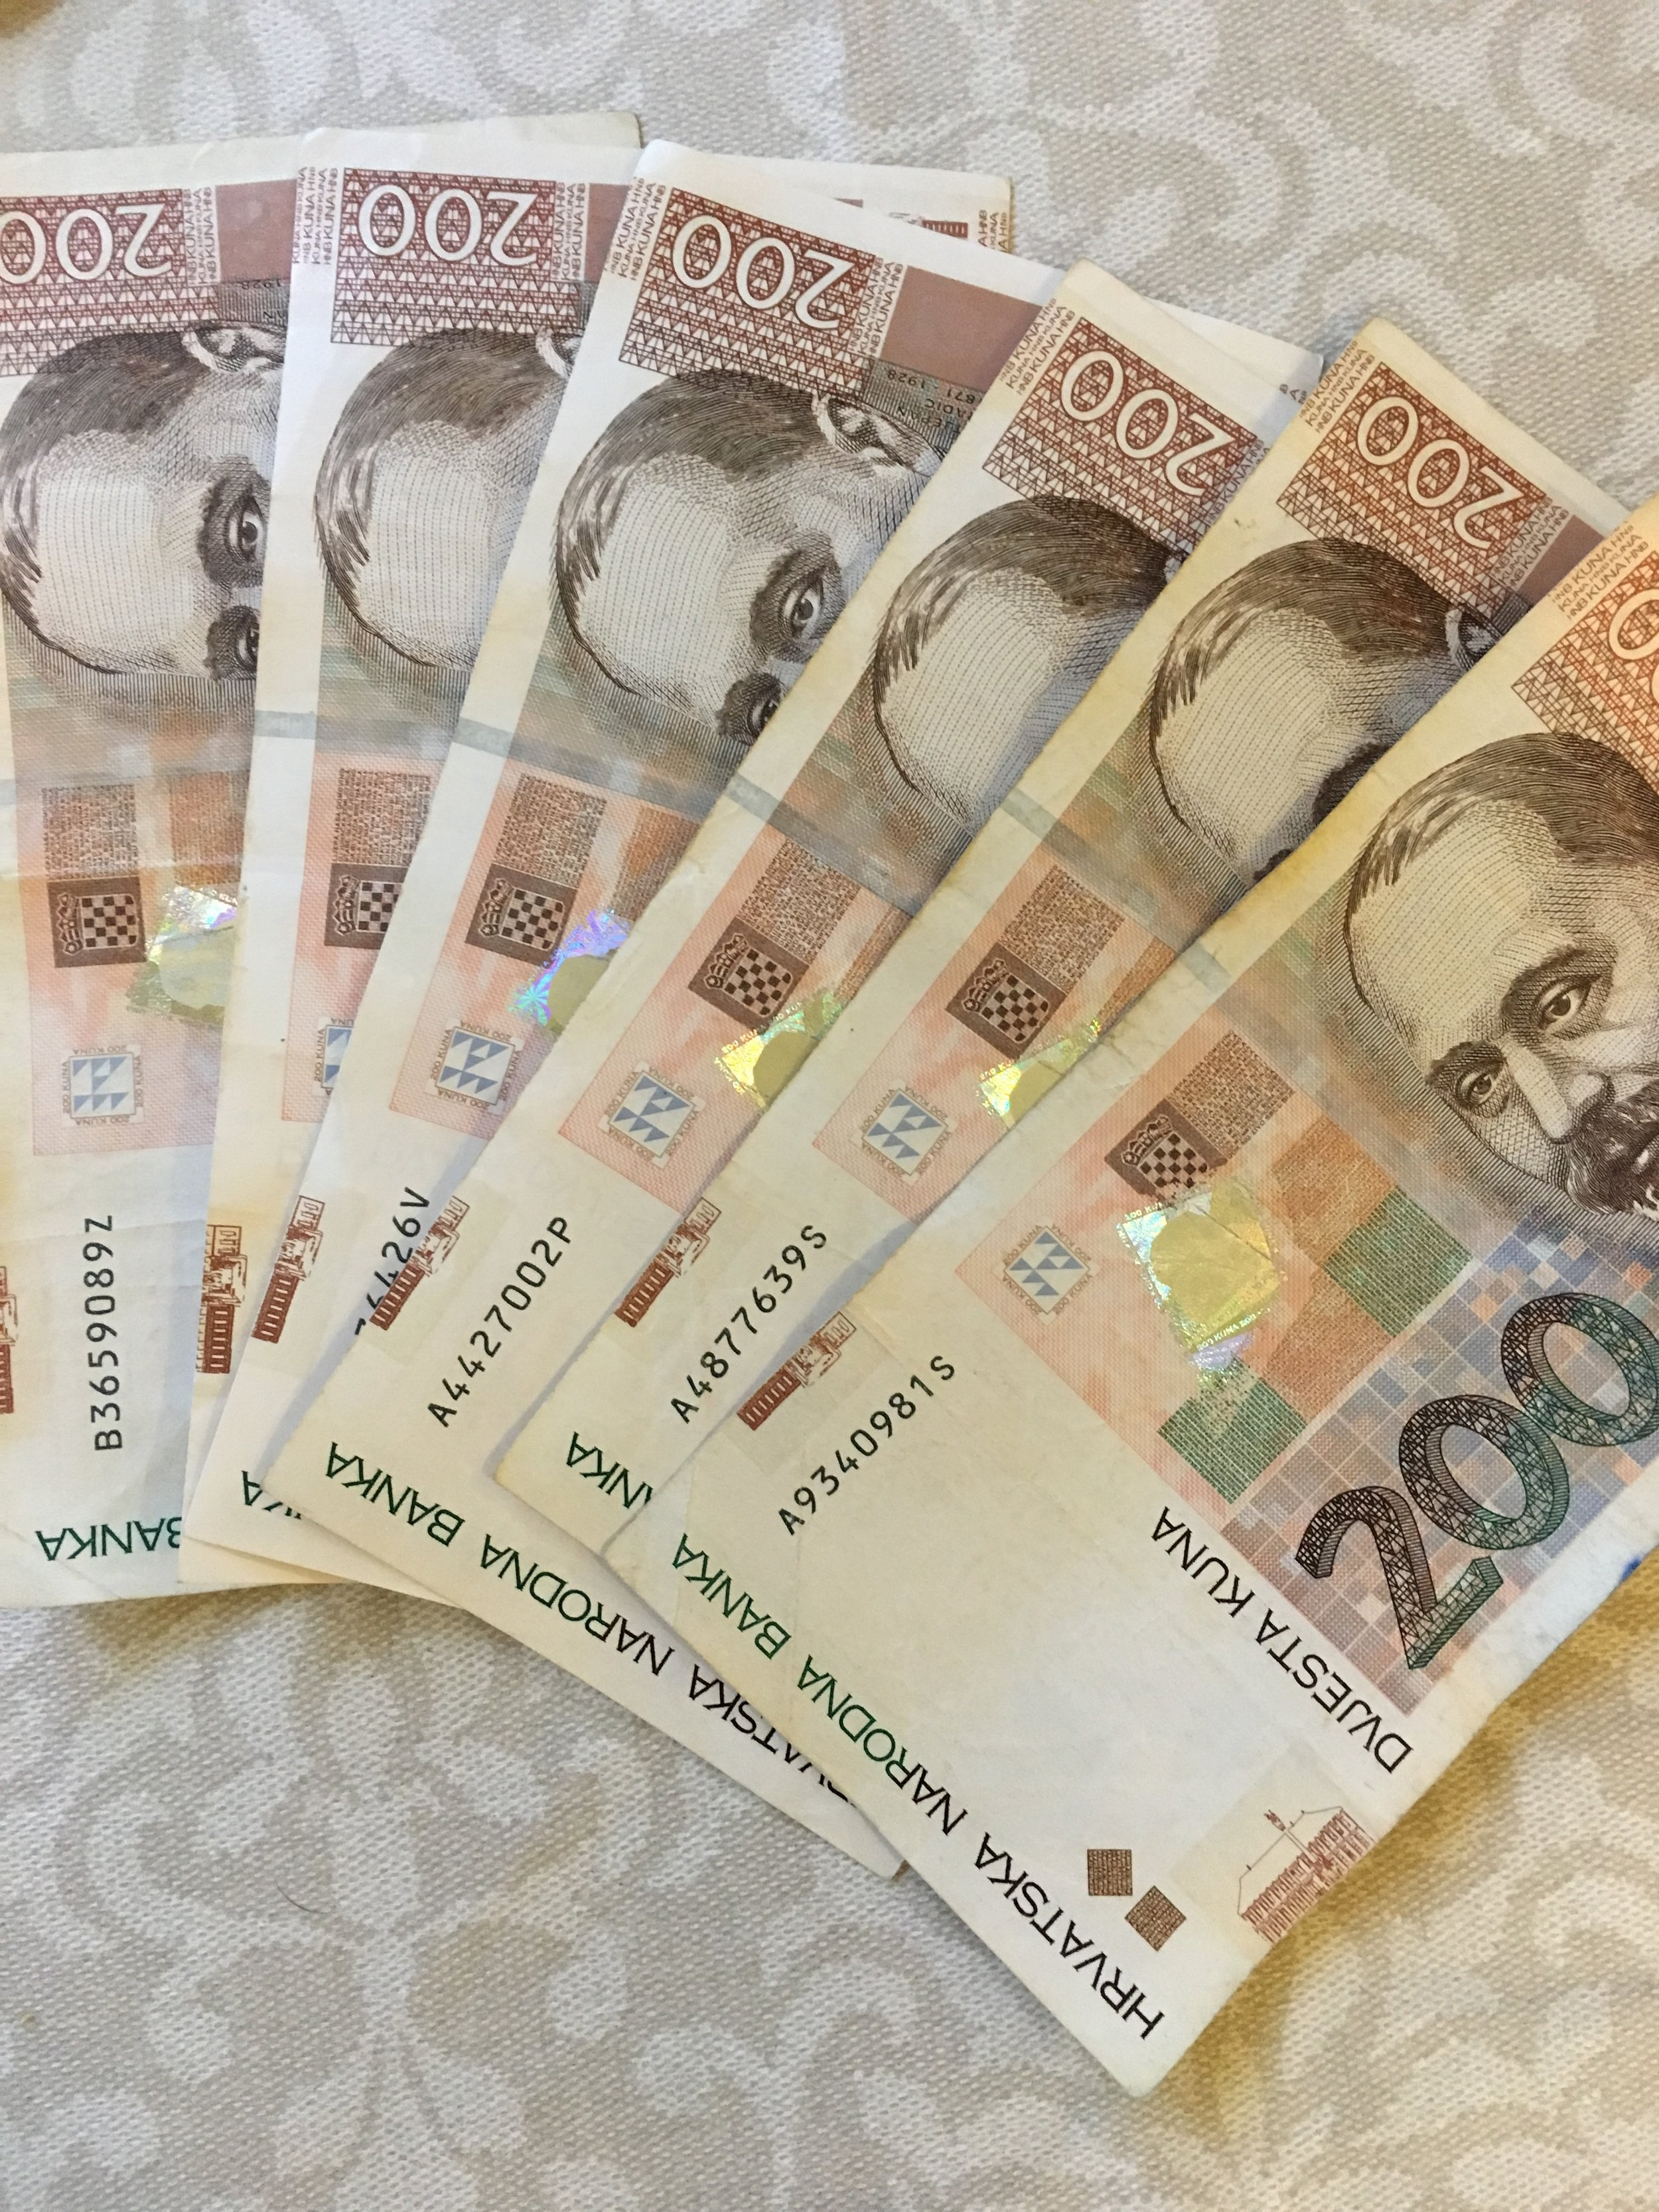 Croatian kuna. $1 is equal to about 6.50 kuna.